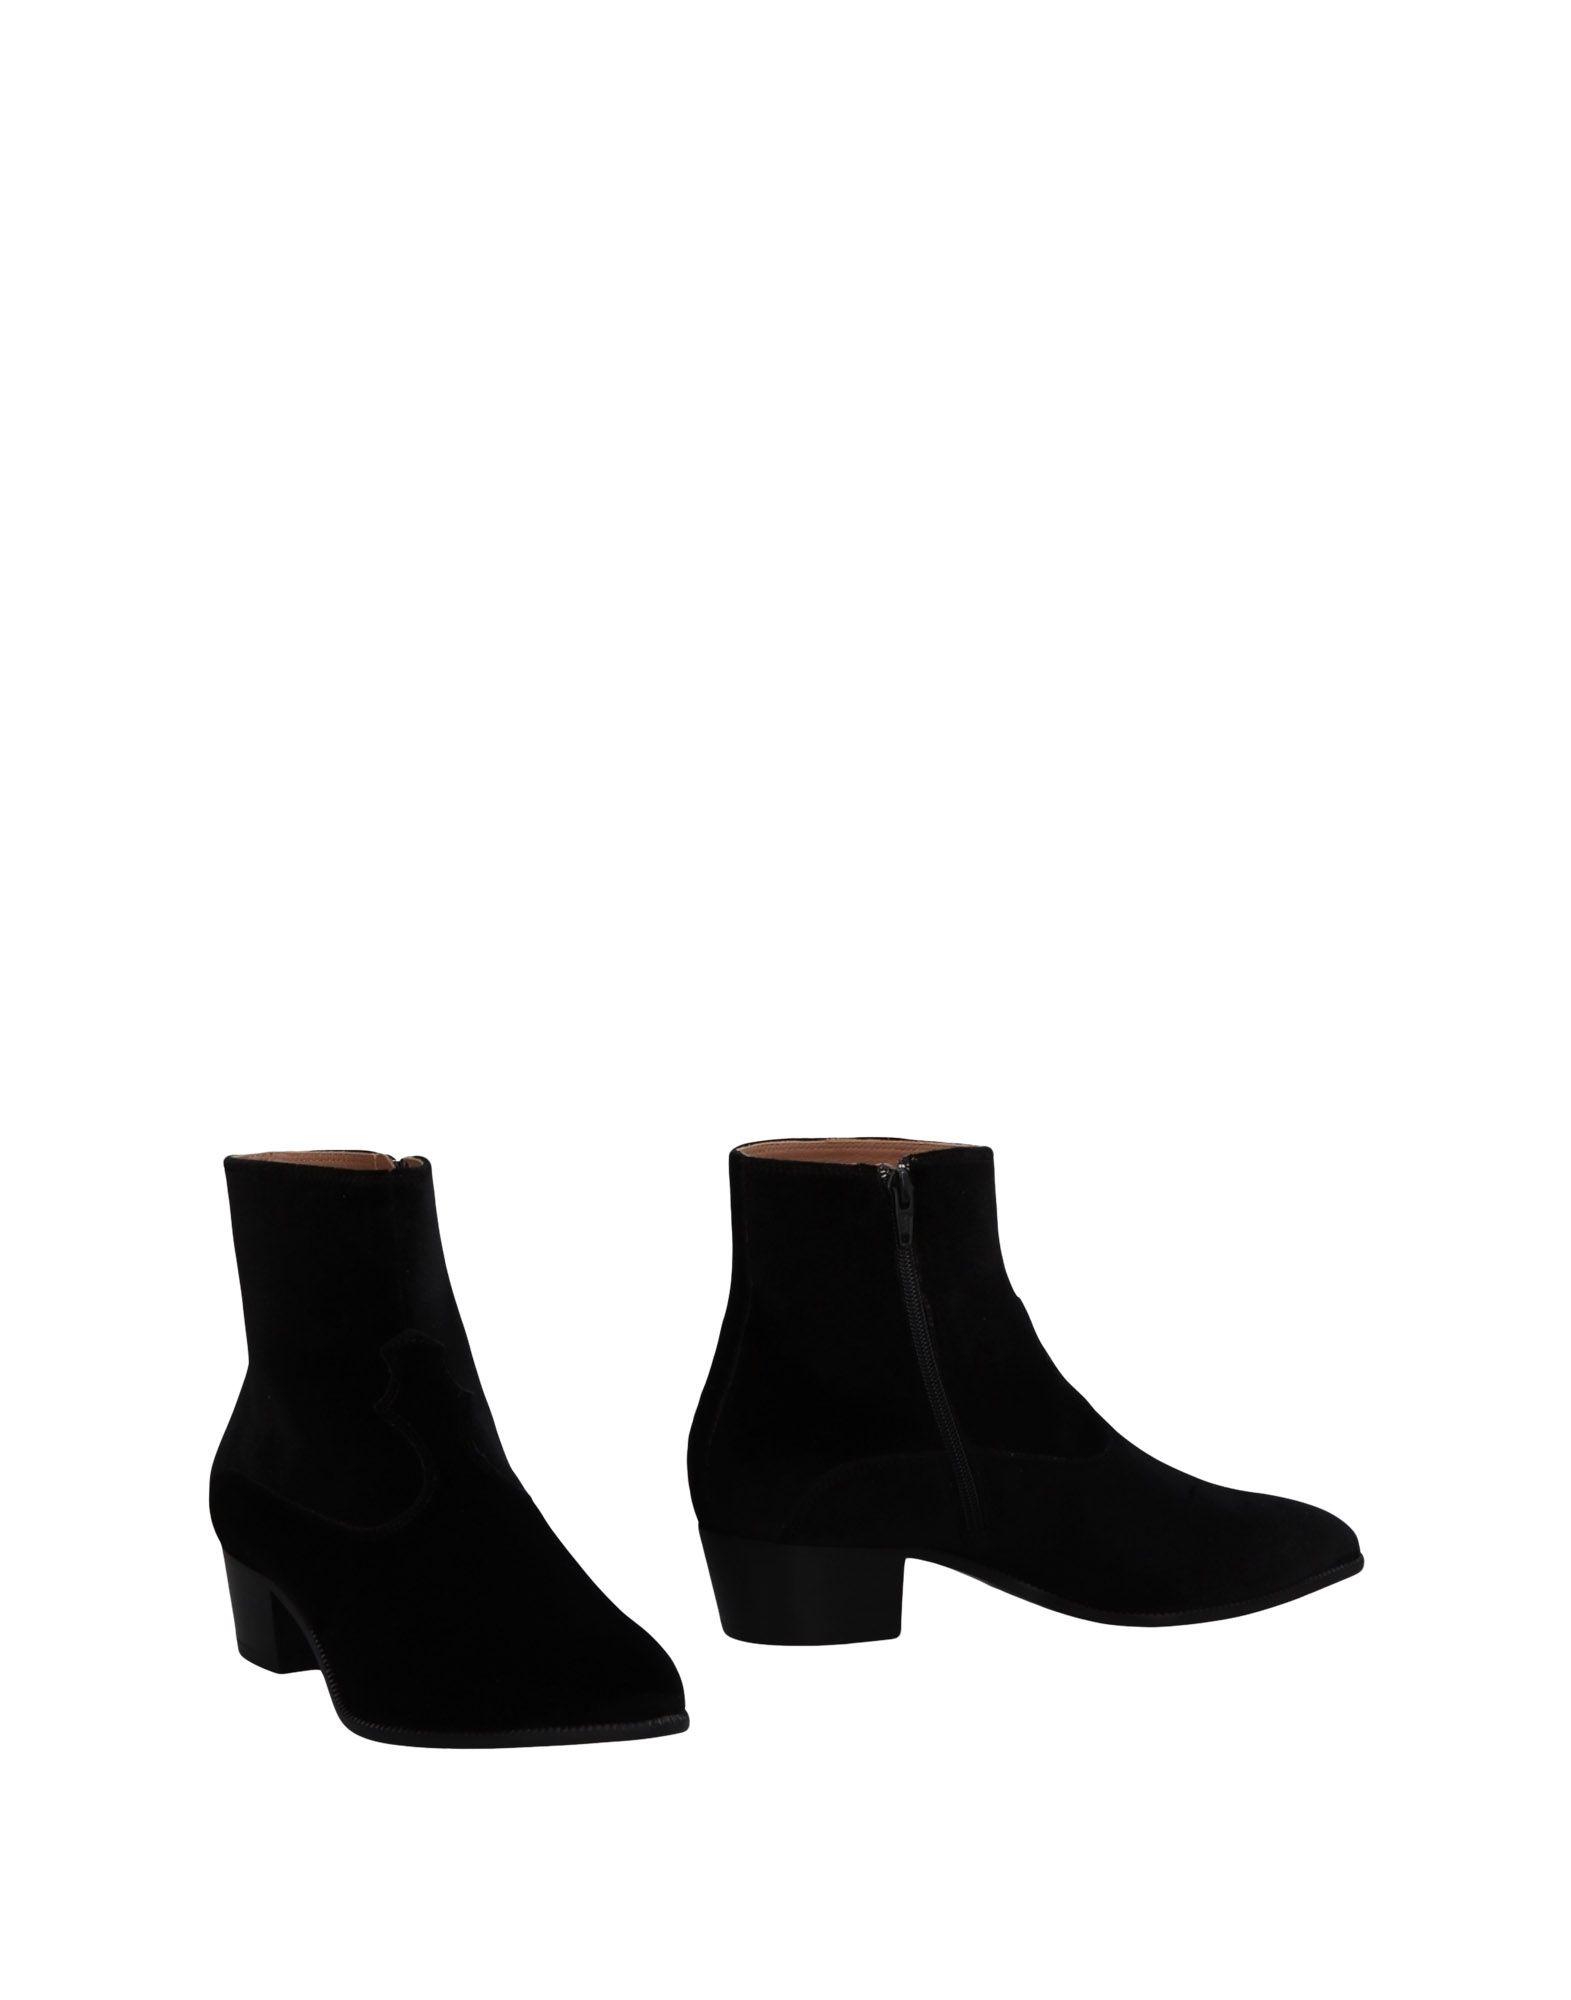 L' AUTRE CHOSE Полусапоги и высокие ботинки 1kg l methionine food grade 99% l methionine